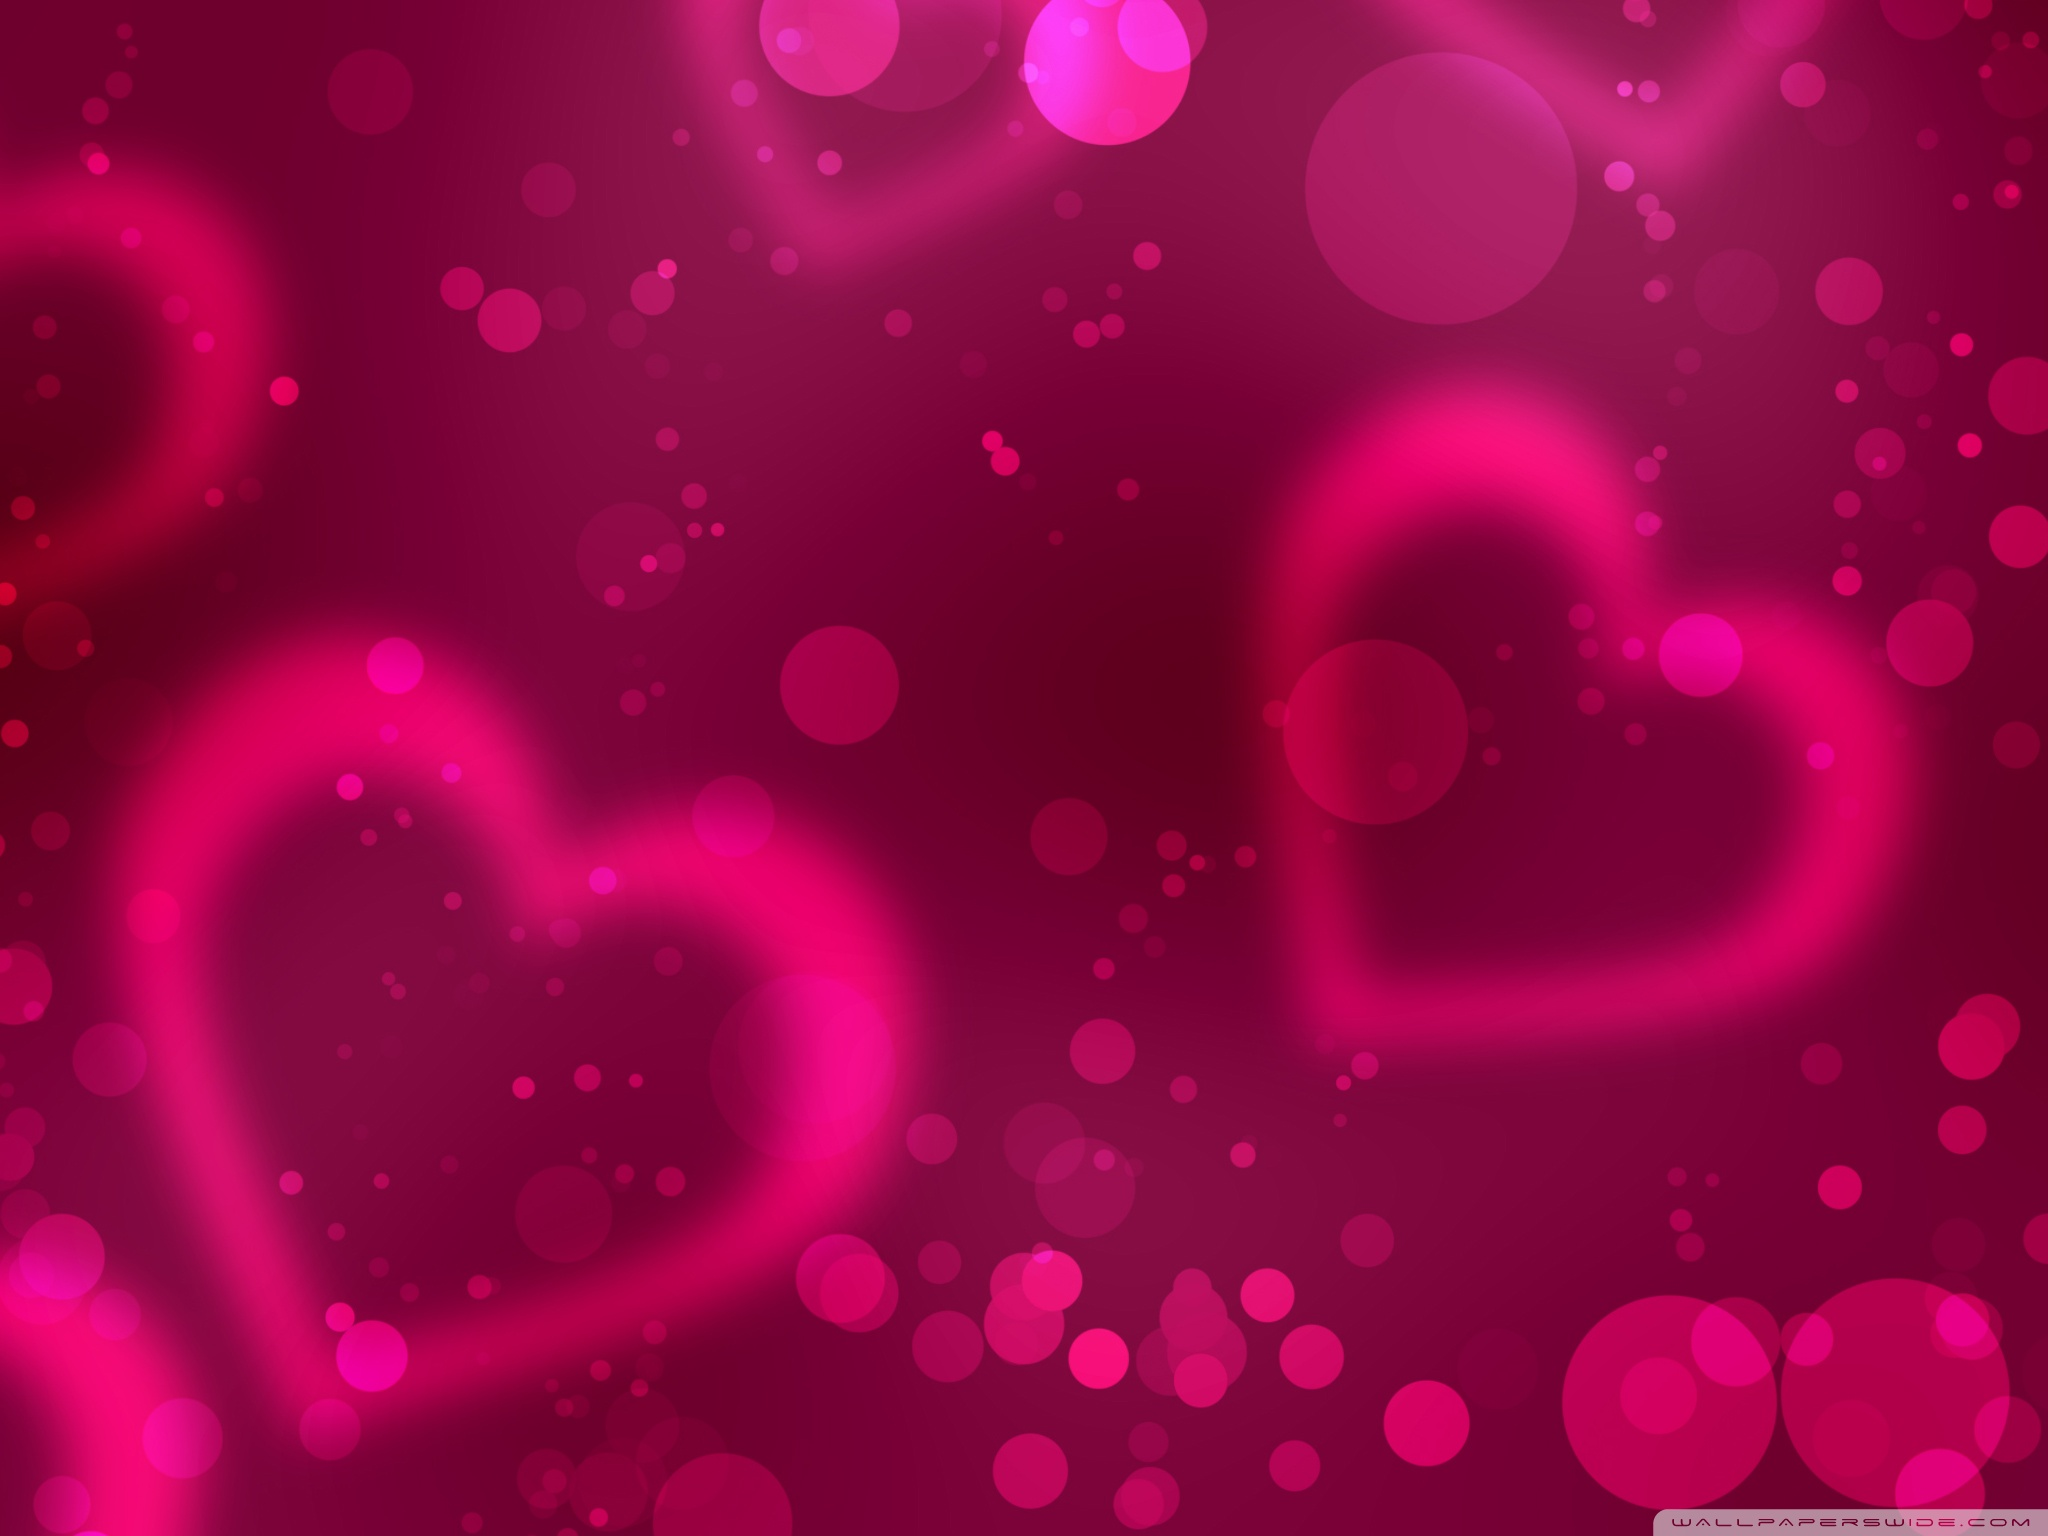 Free Download Valentine S Day Desktop Wallpapers Top Various